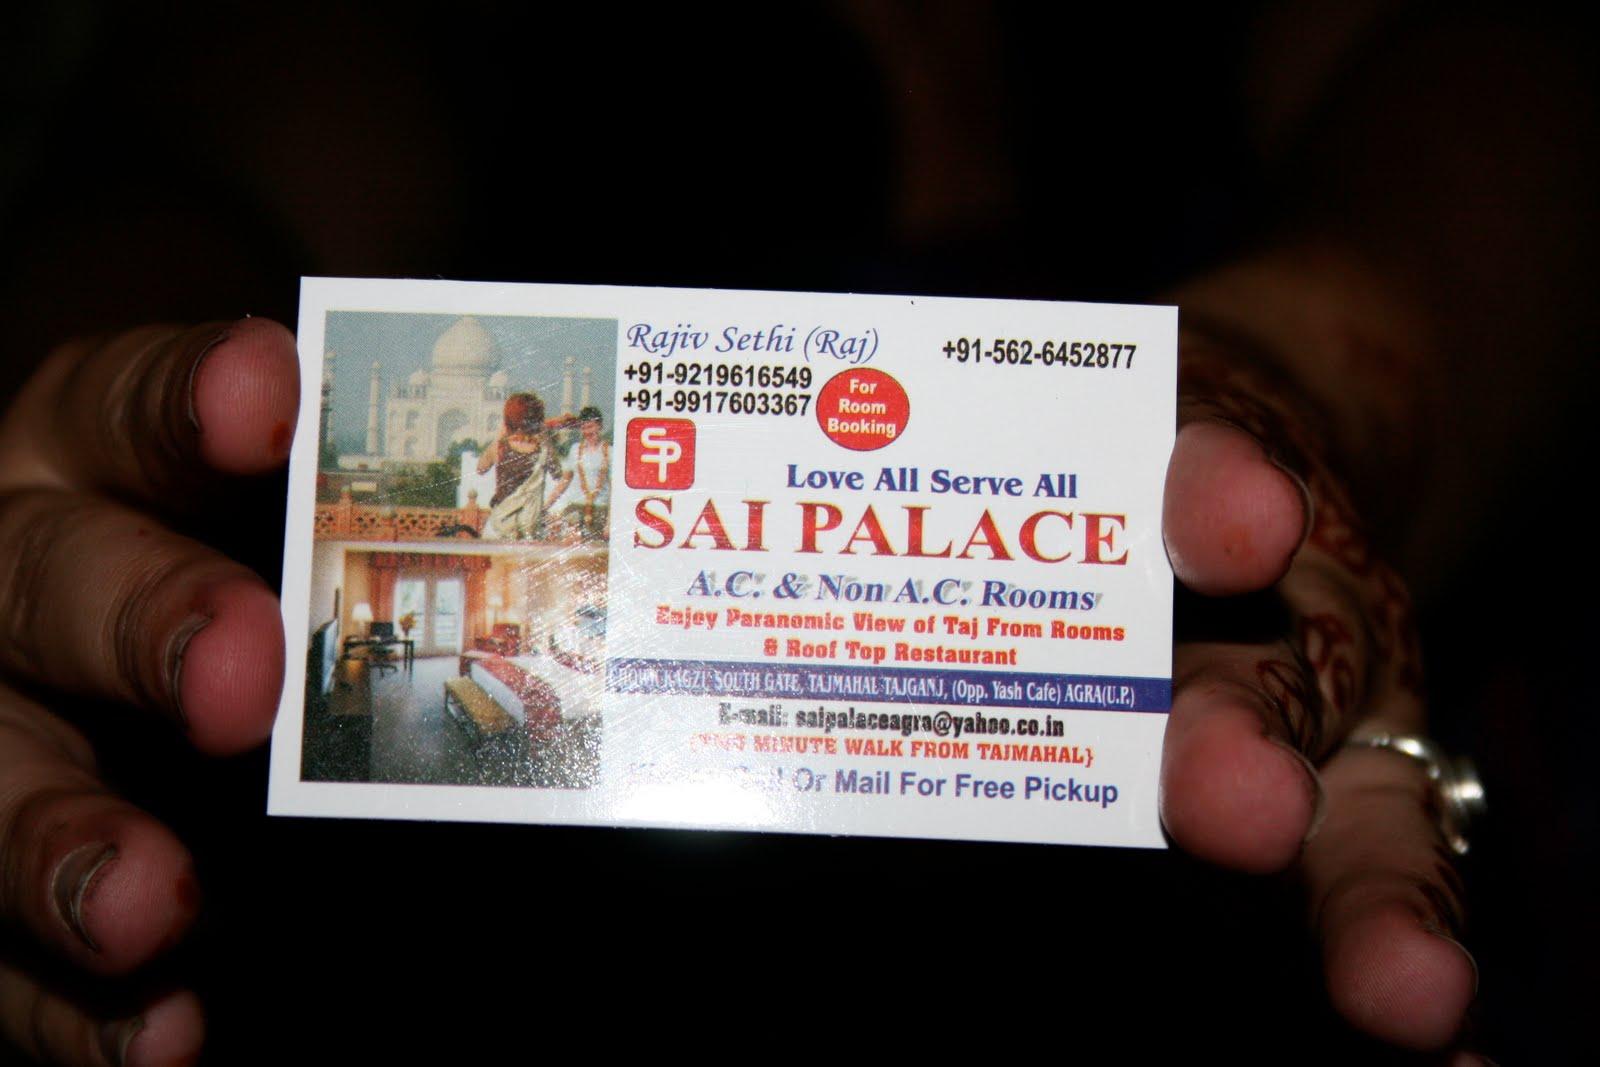 hotel om sai palace agra